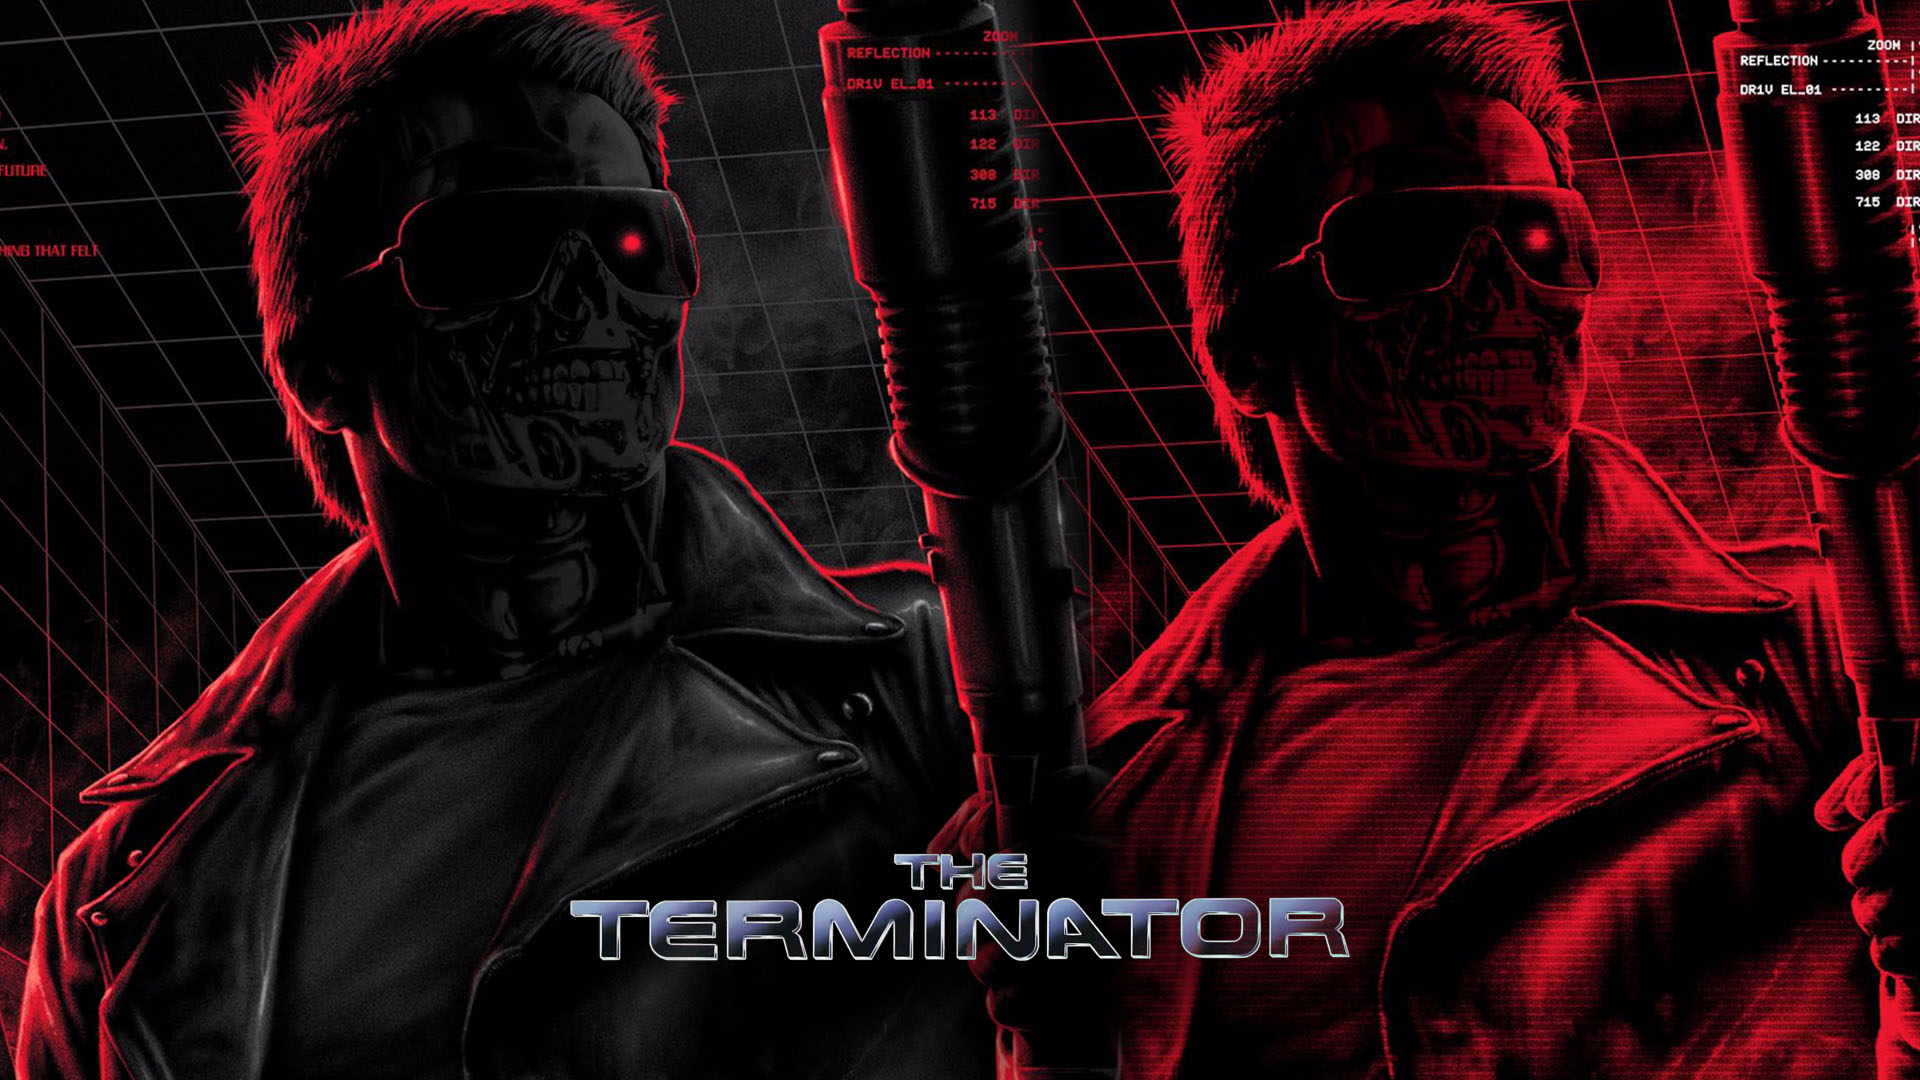 The Terminator Poster by Matt Ryan Tobin